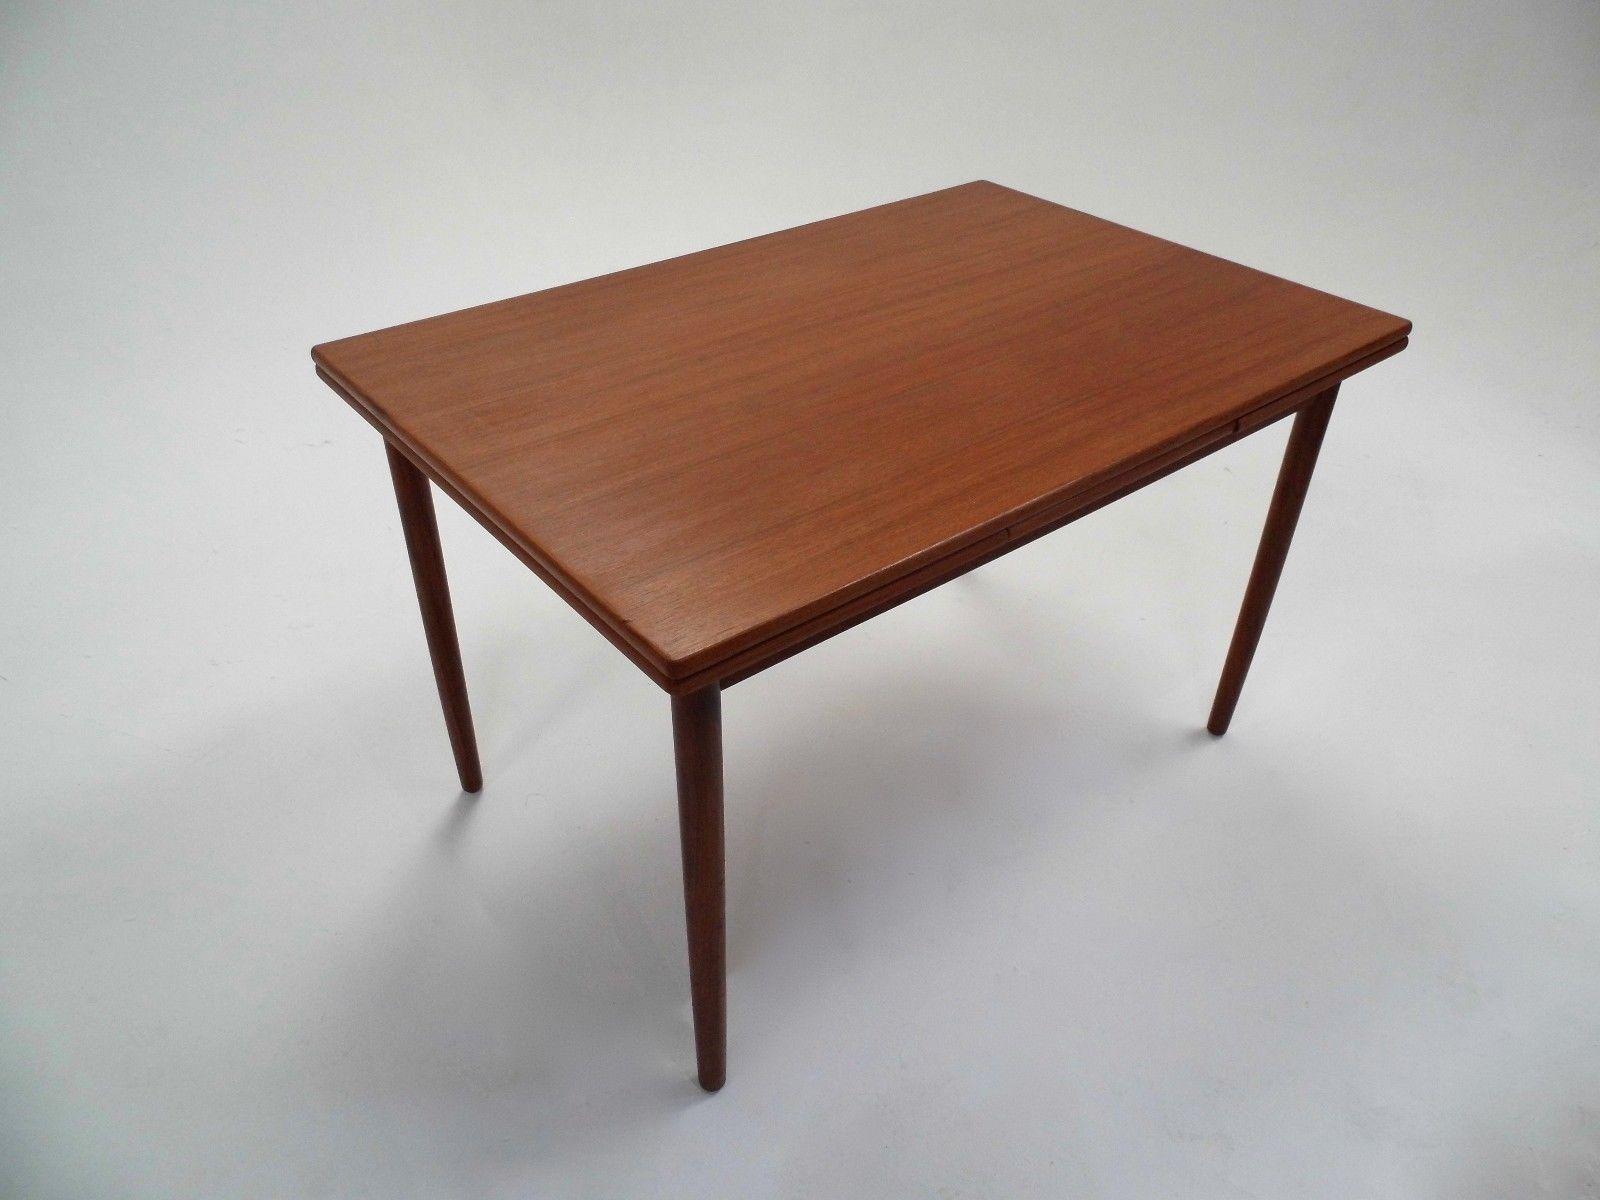 Danish Teak Extending Dining Table 1960s for sale at Pamono : danish teak extending dining table 1960s 2 from www.pamono.com size 1600 x 1200 jpeg 134kB